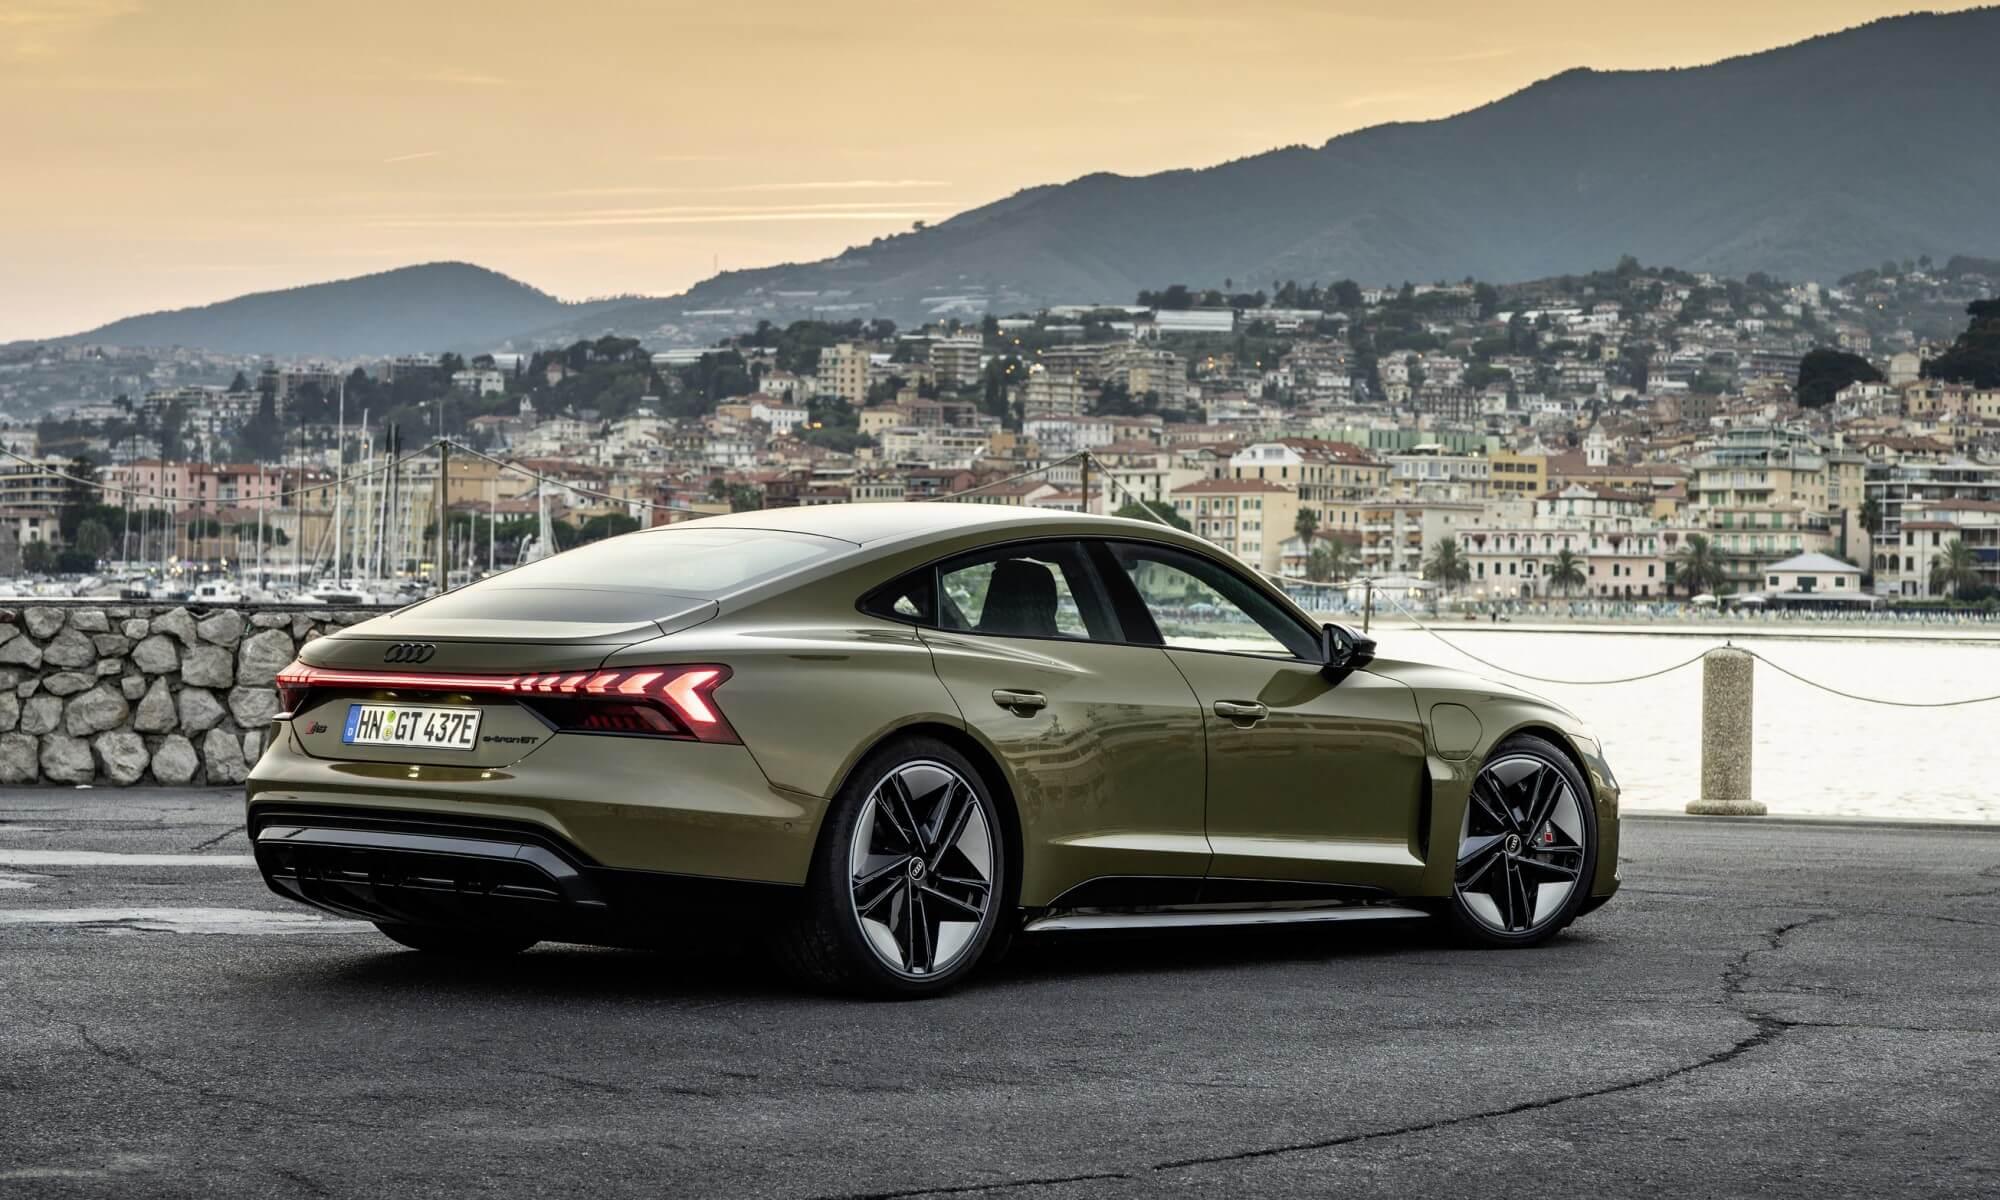 Audi's Quattro technology in the EV age